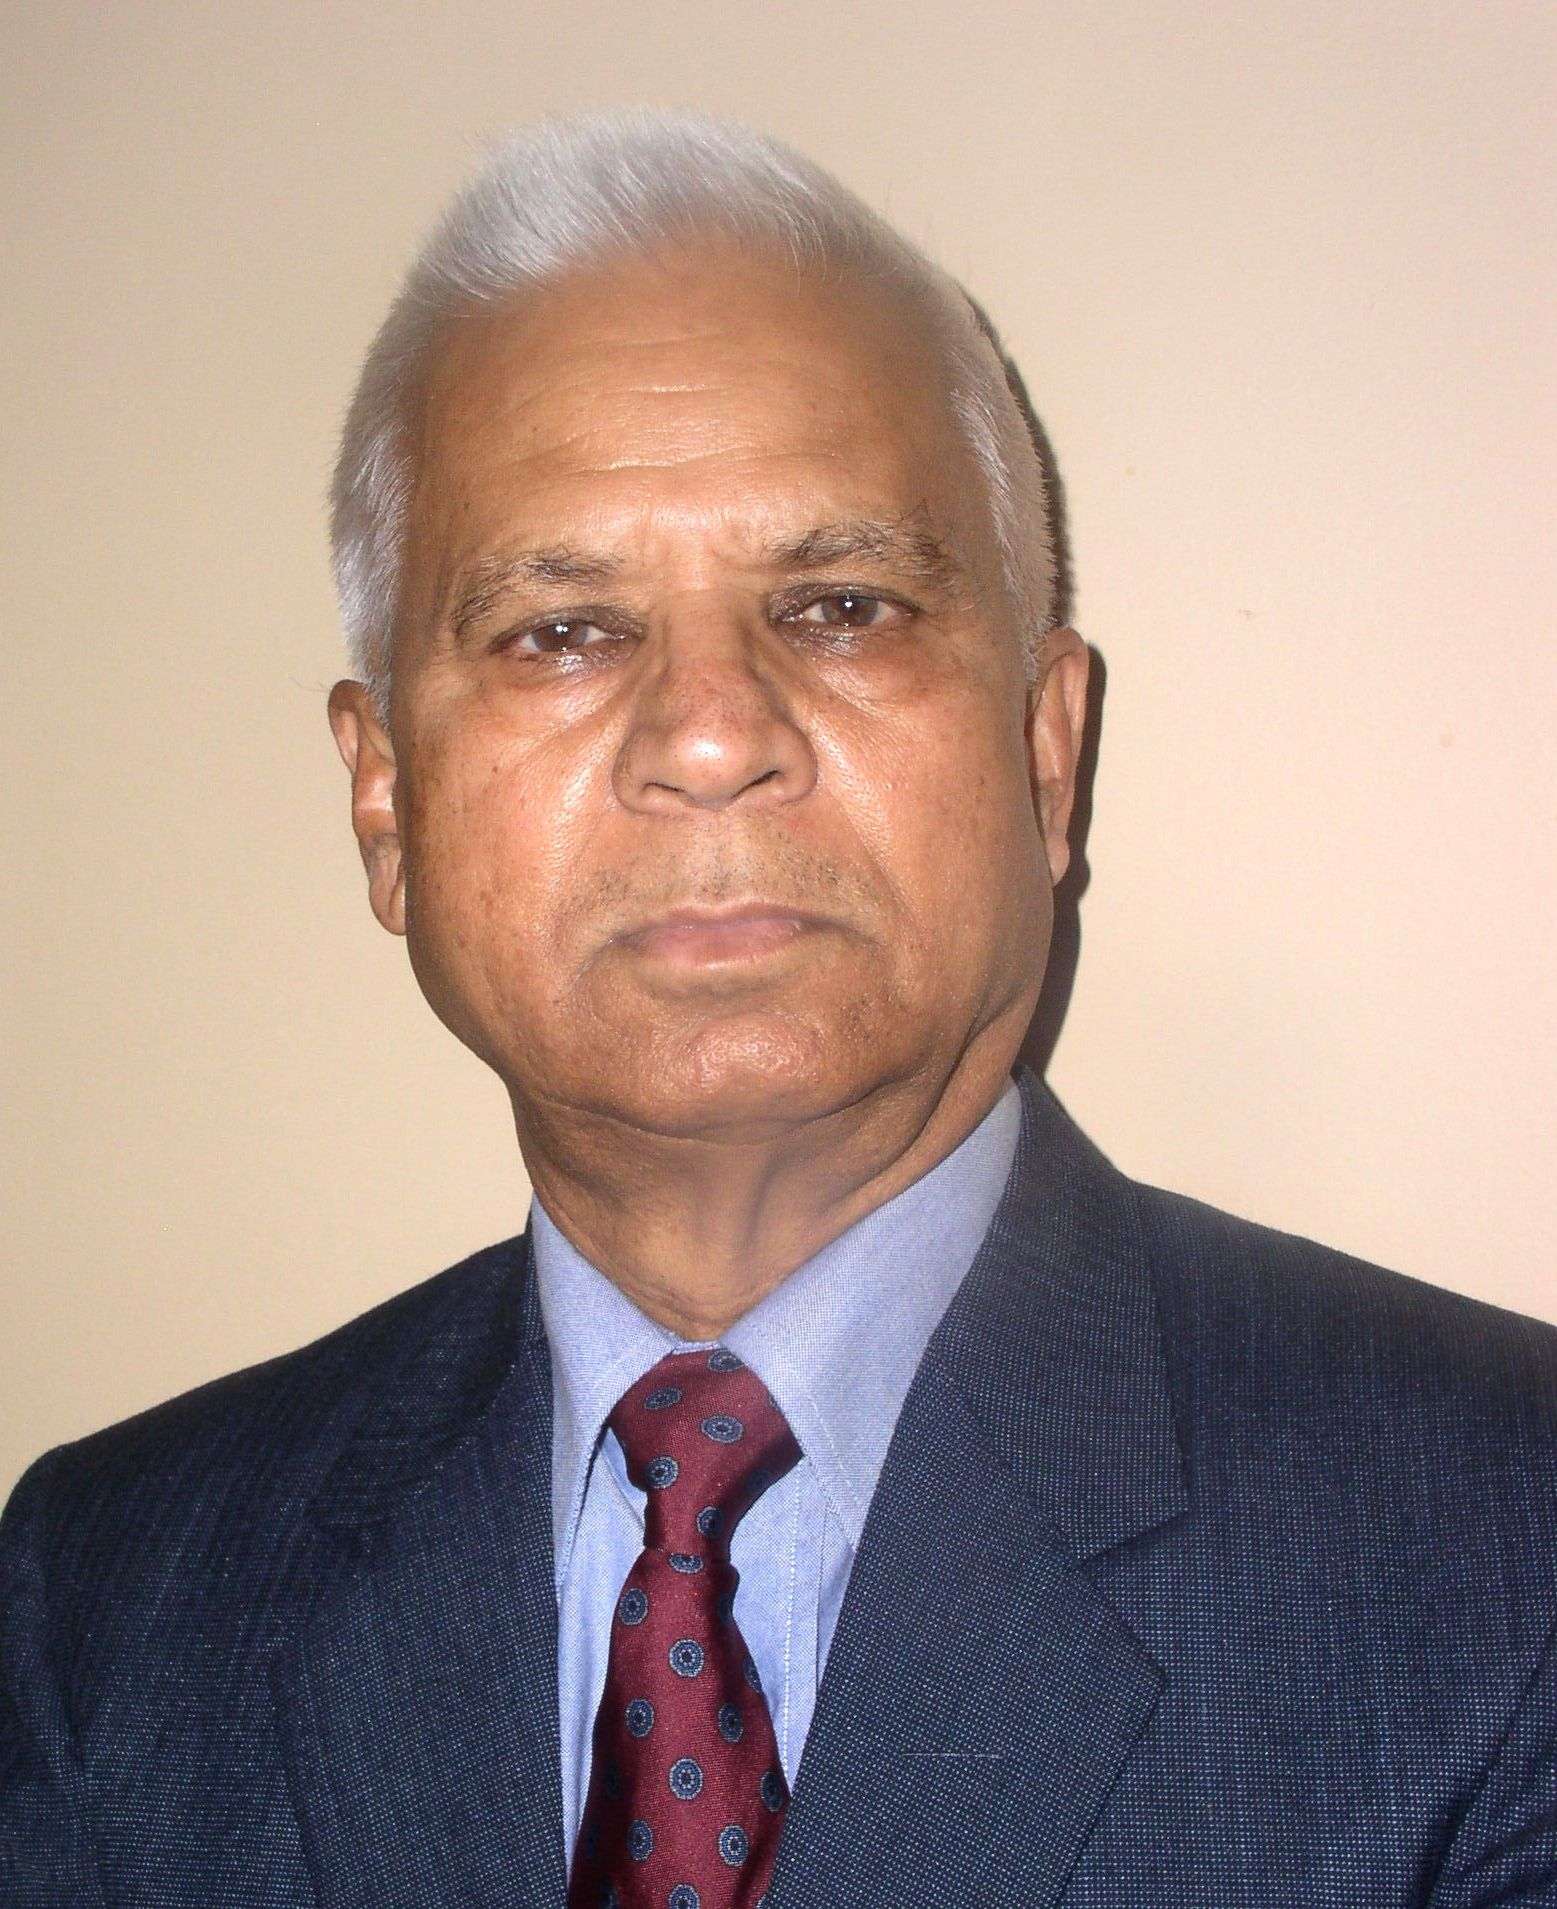 Chand K Sharma